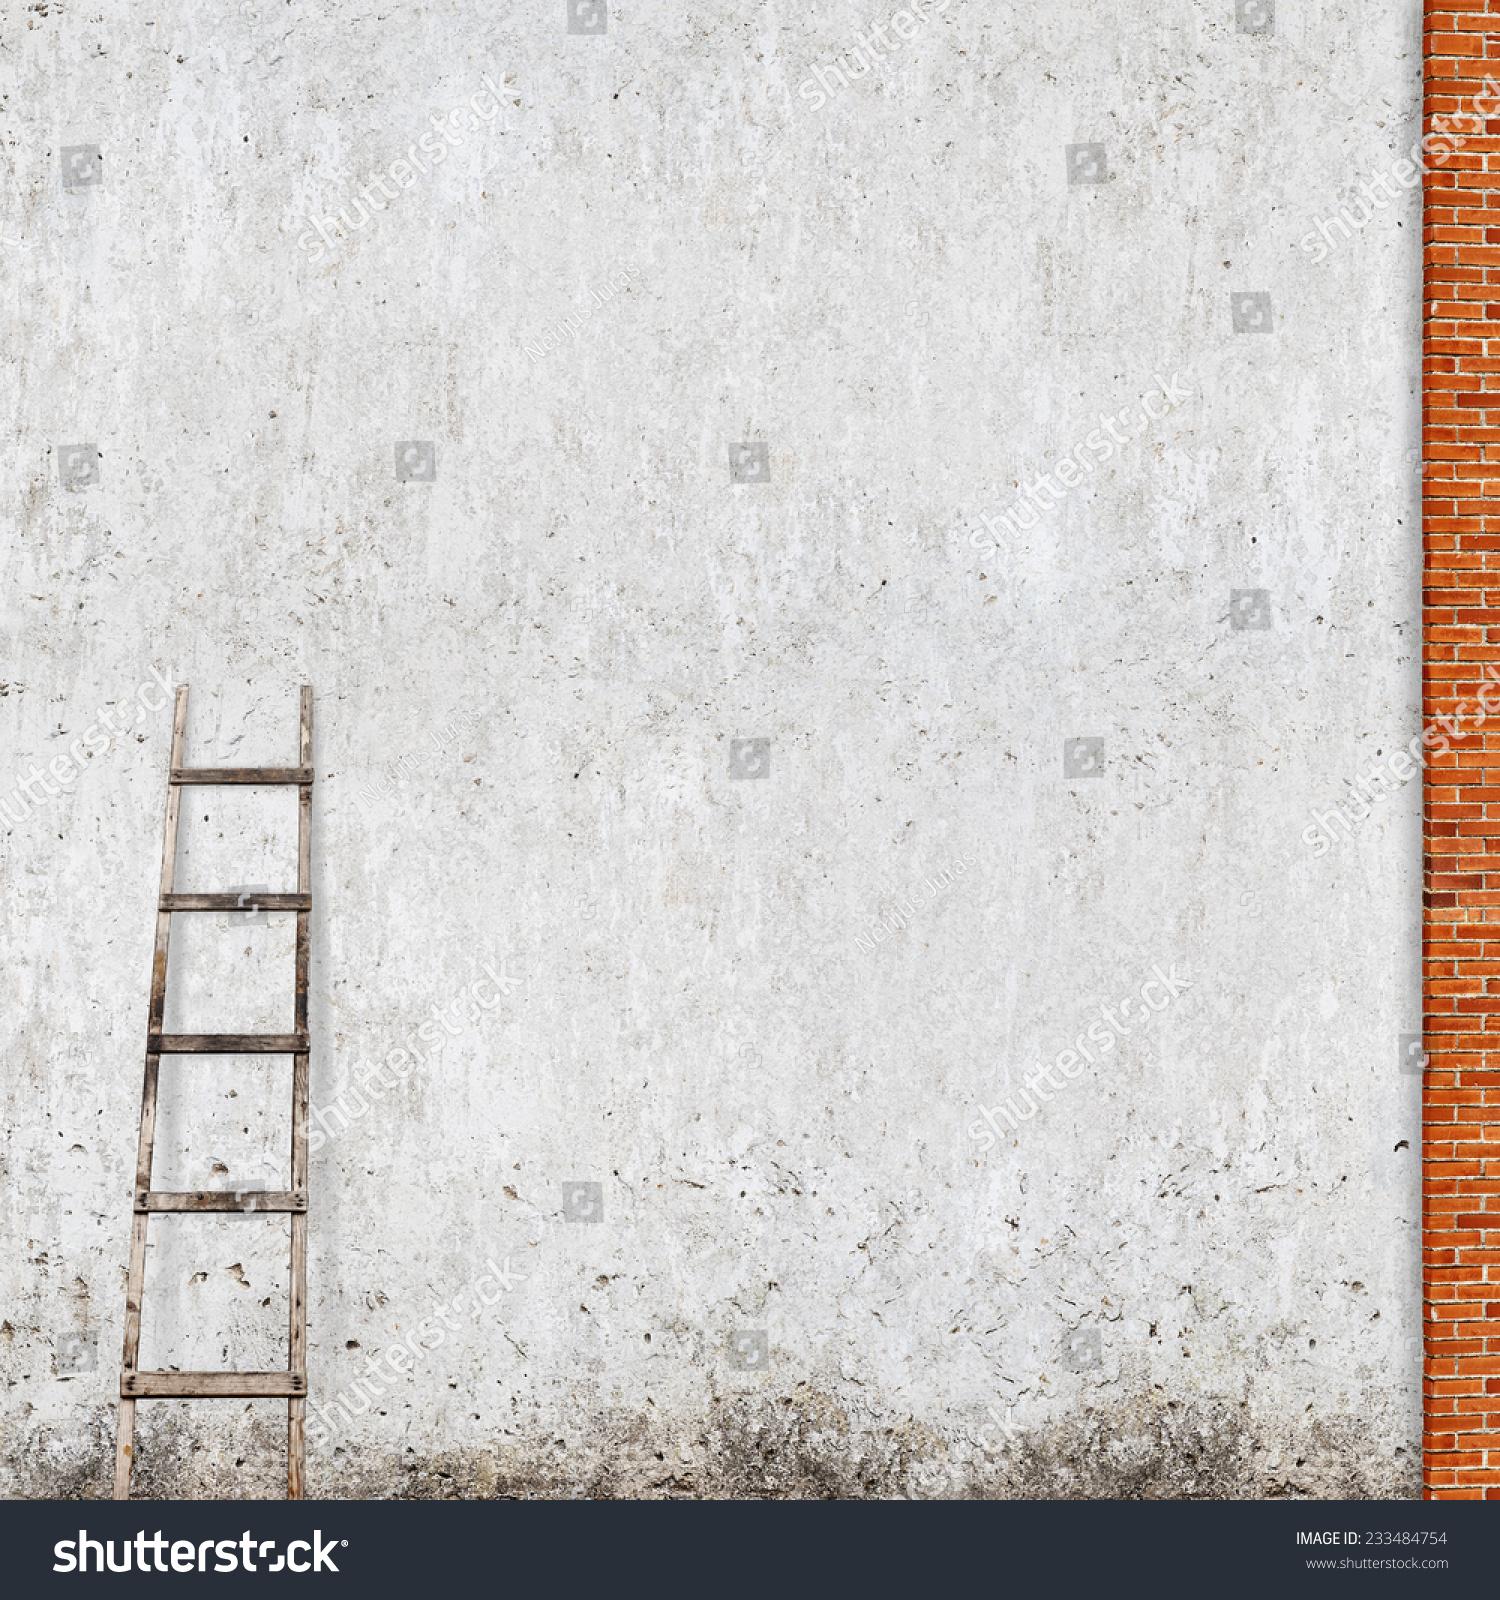 Stucco On Frame : Weathered stucco wall red brick frame stock photo